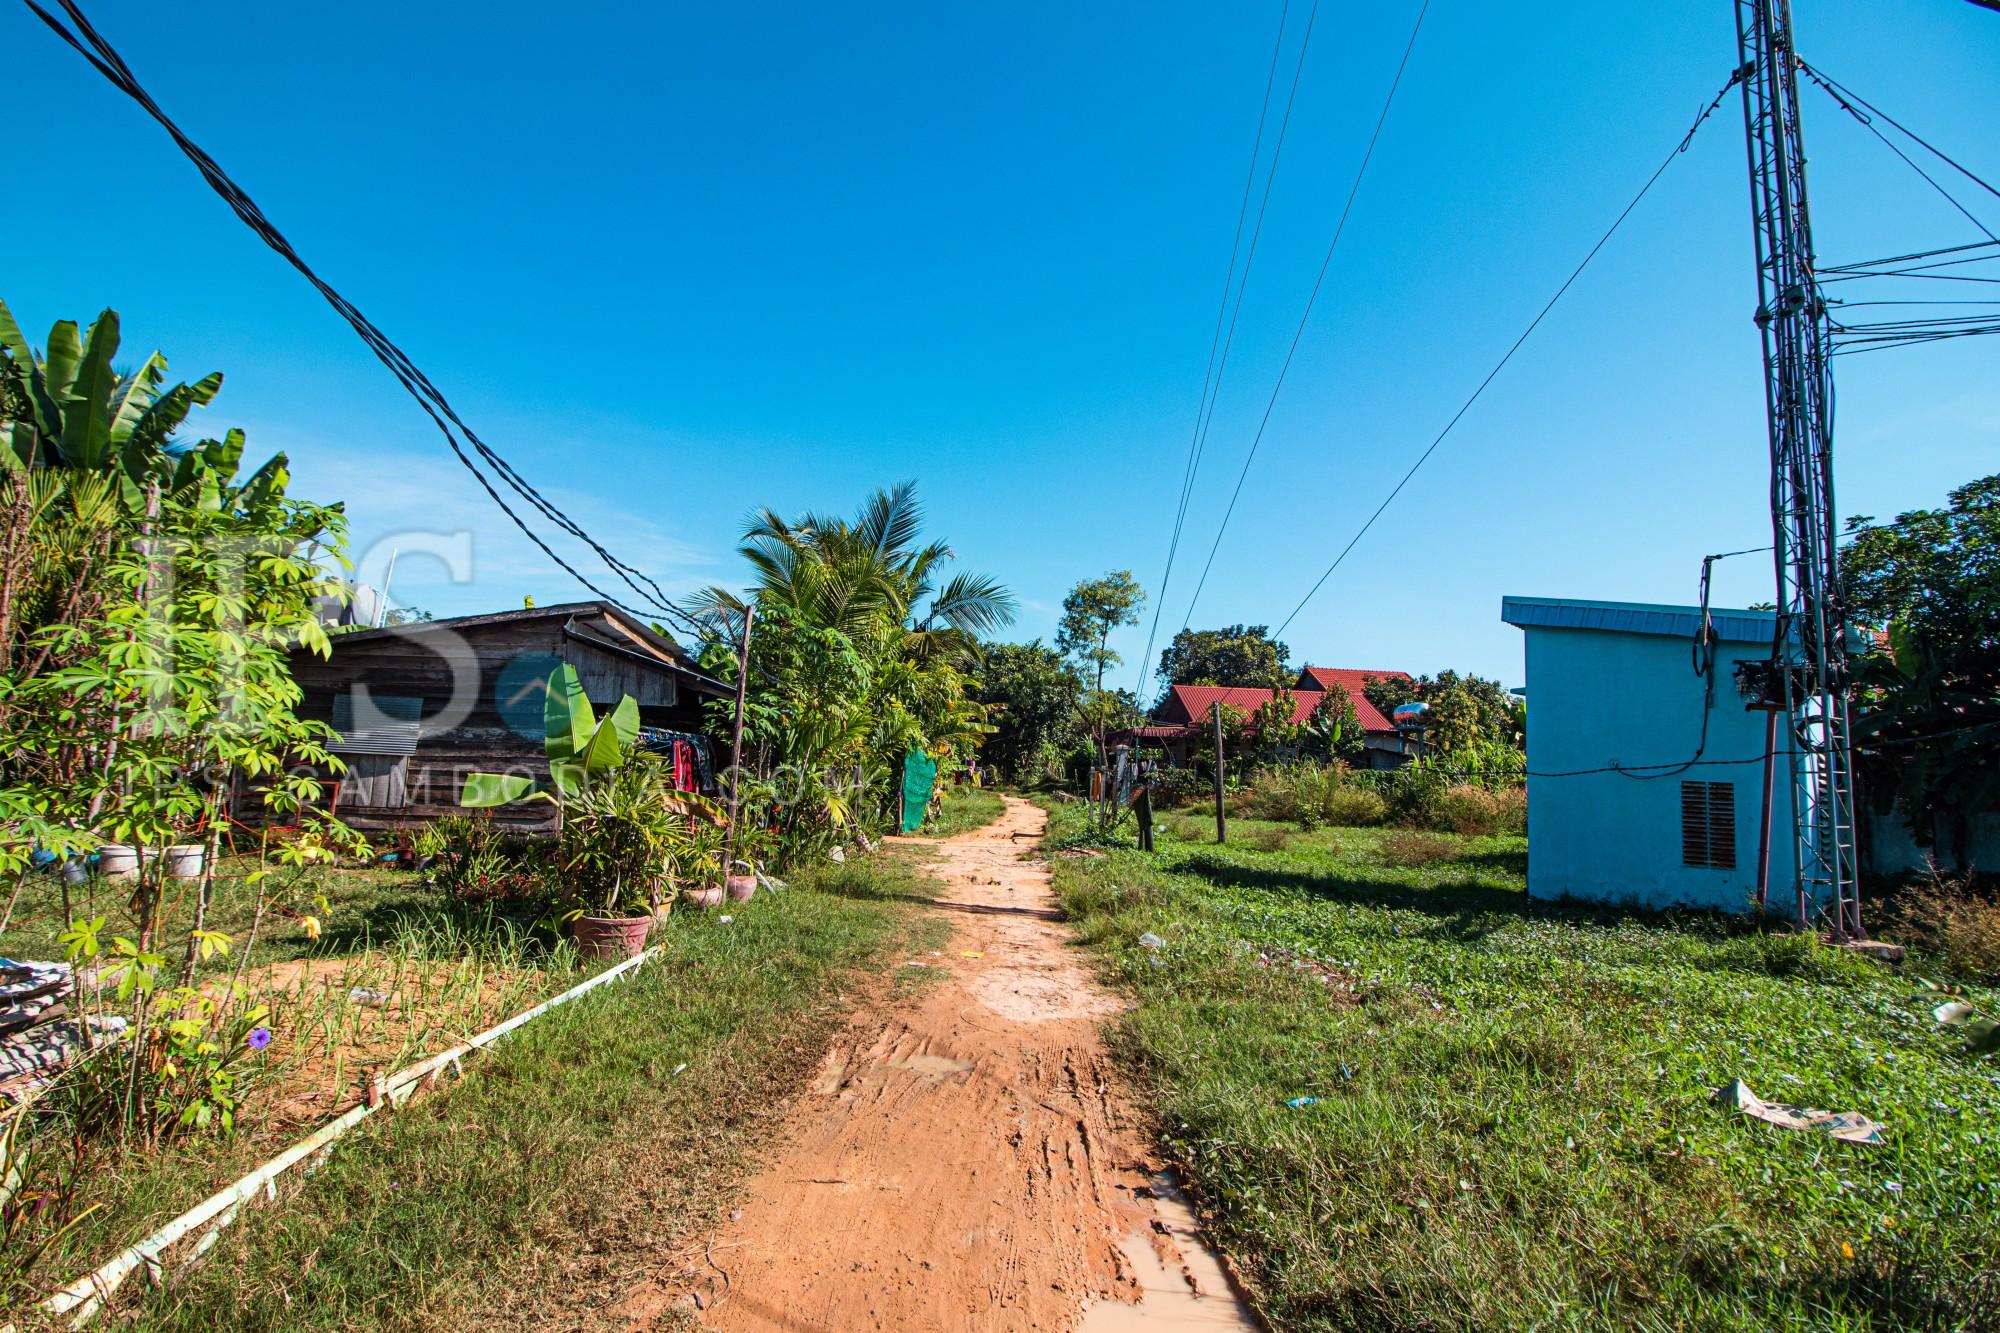 119 Sqm Land For Sale - Sra Ngae, Siem Reap